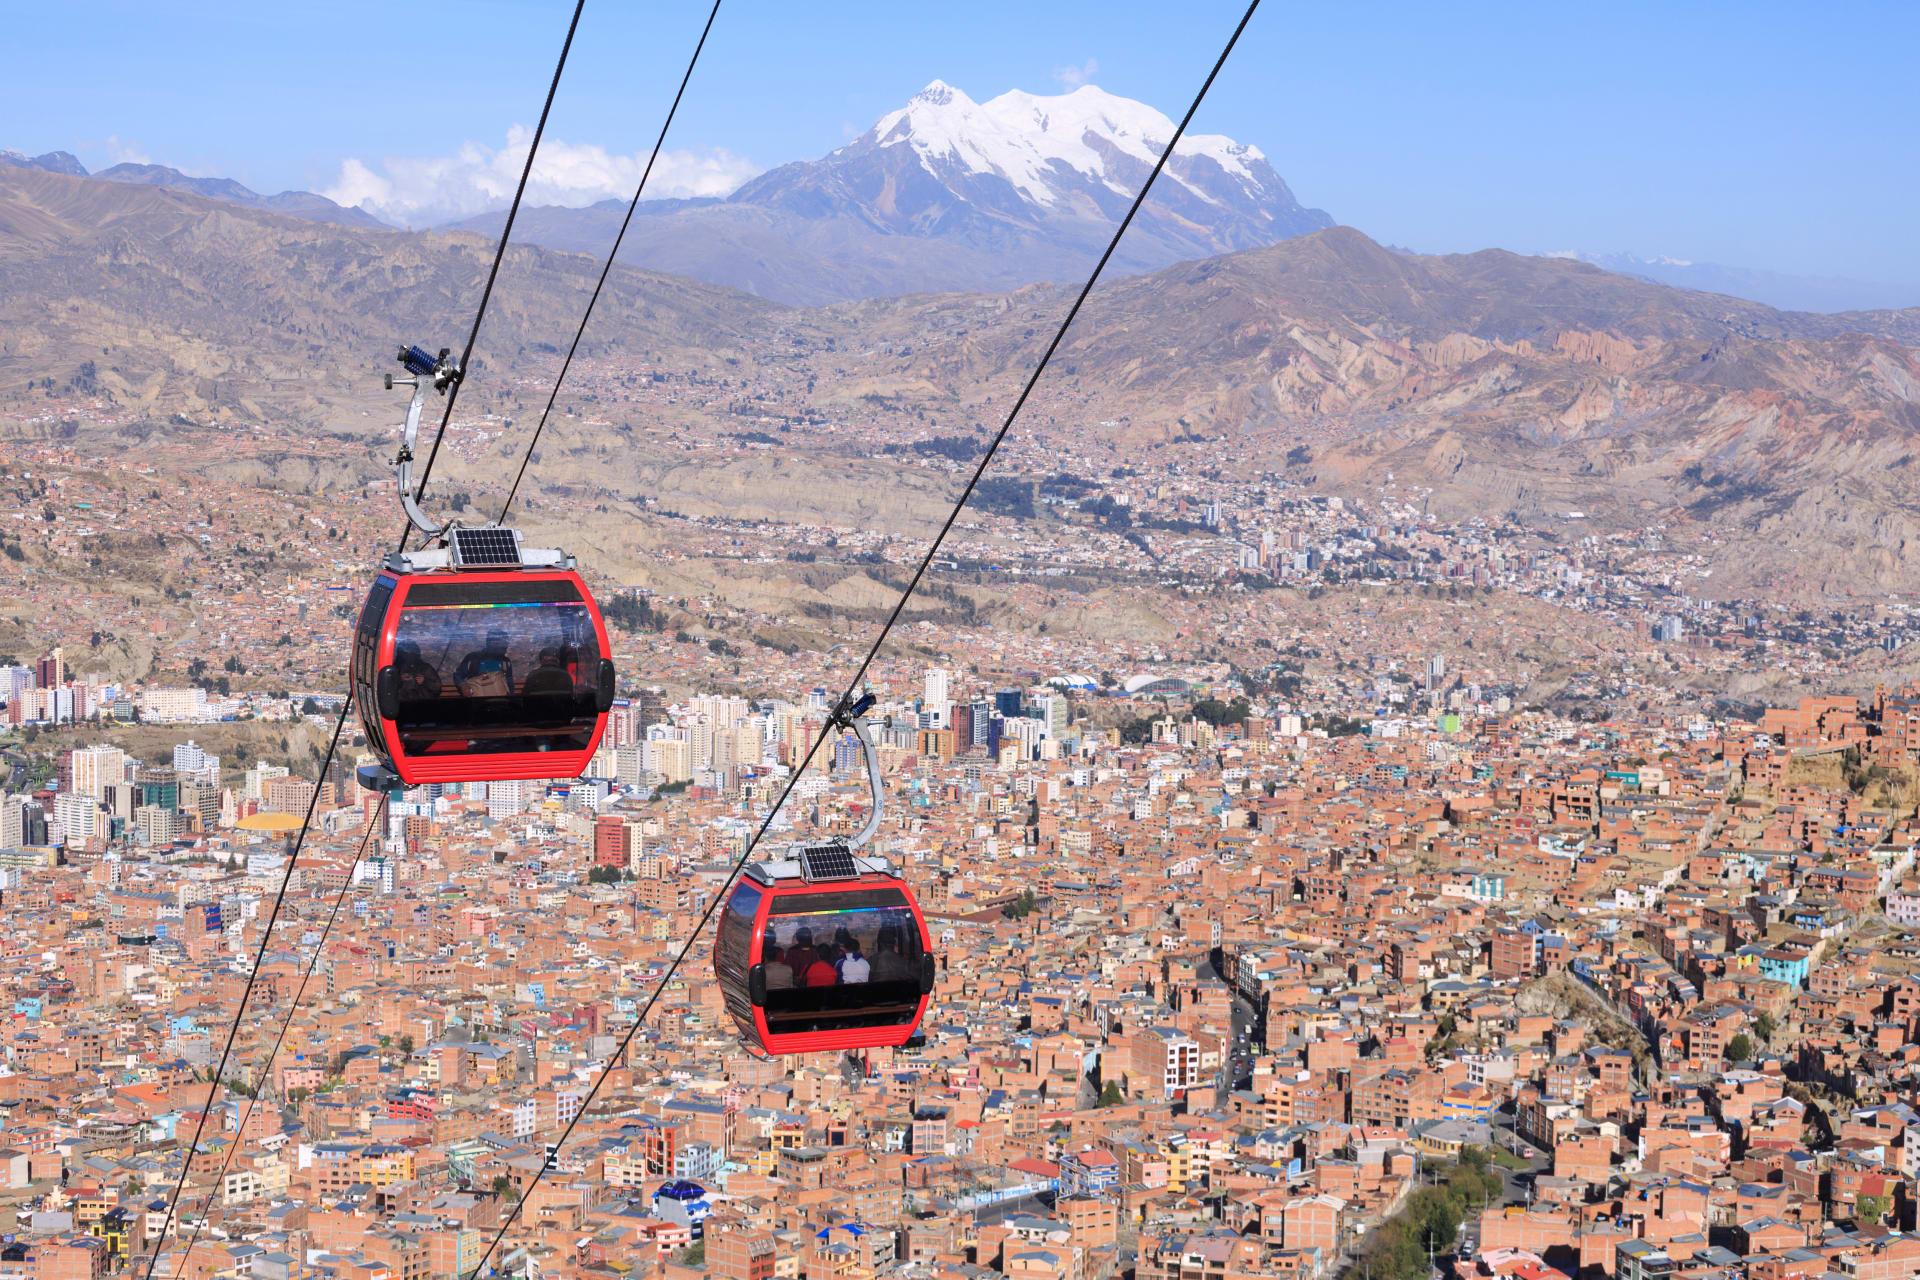 La Paz - Cable Car Ride over La Paz